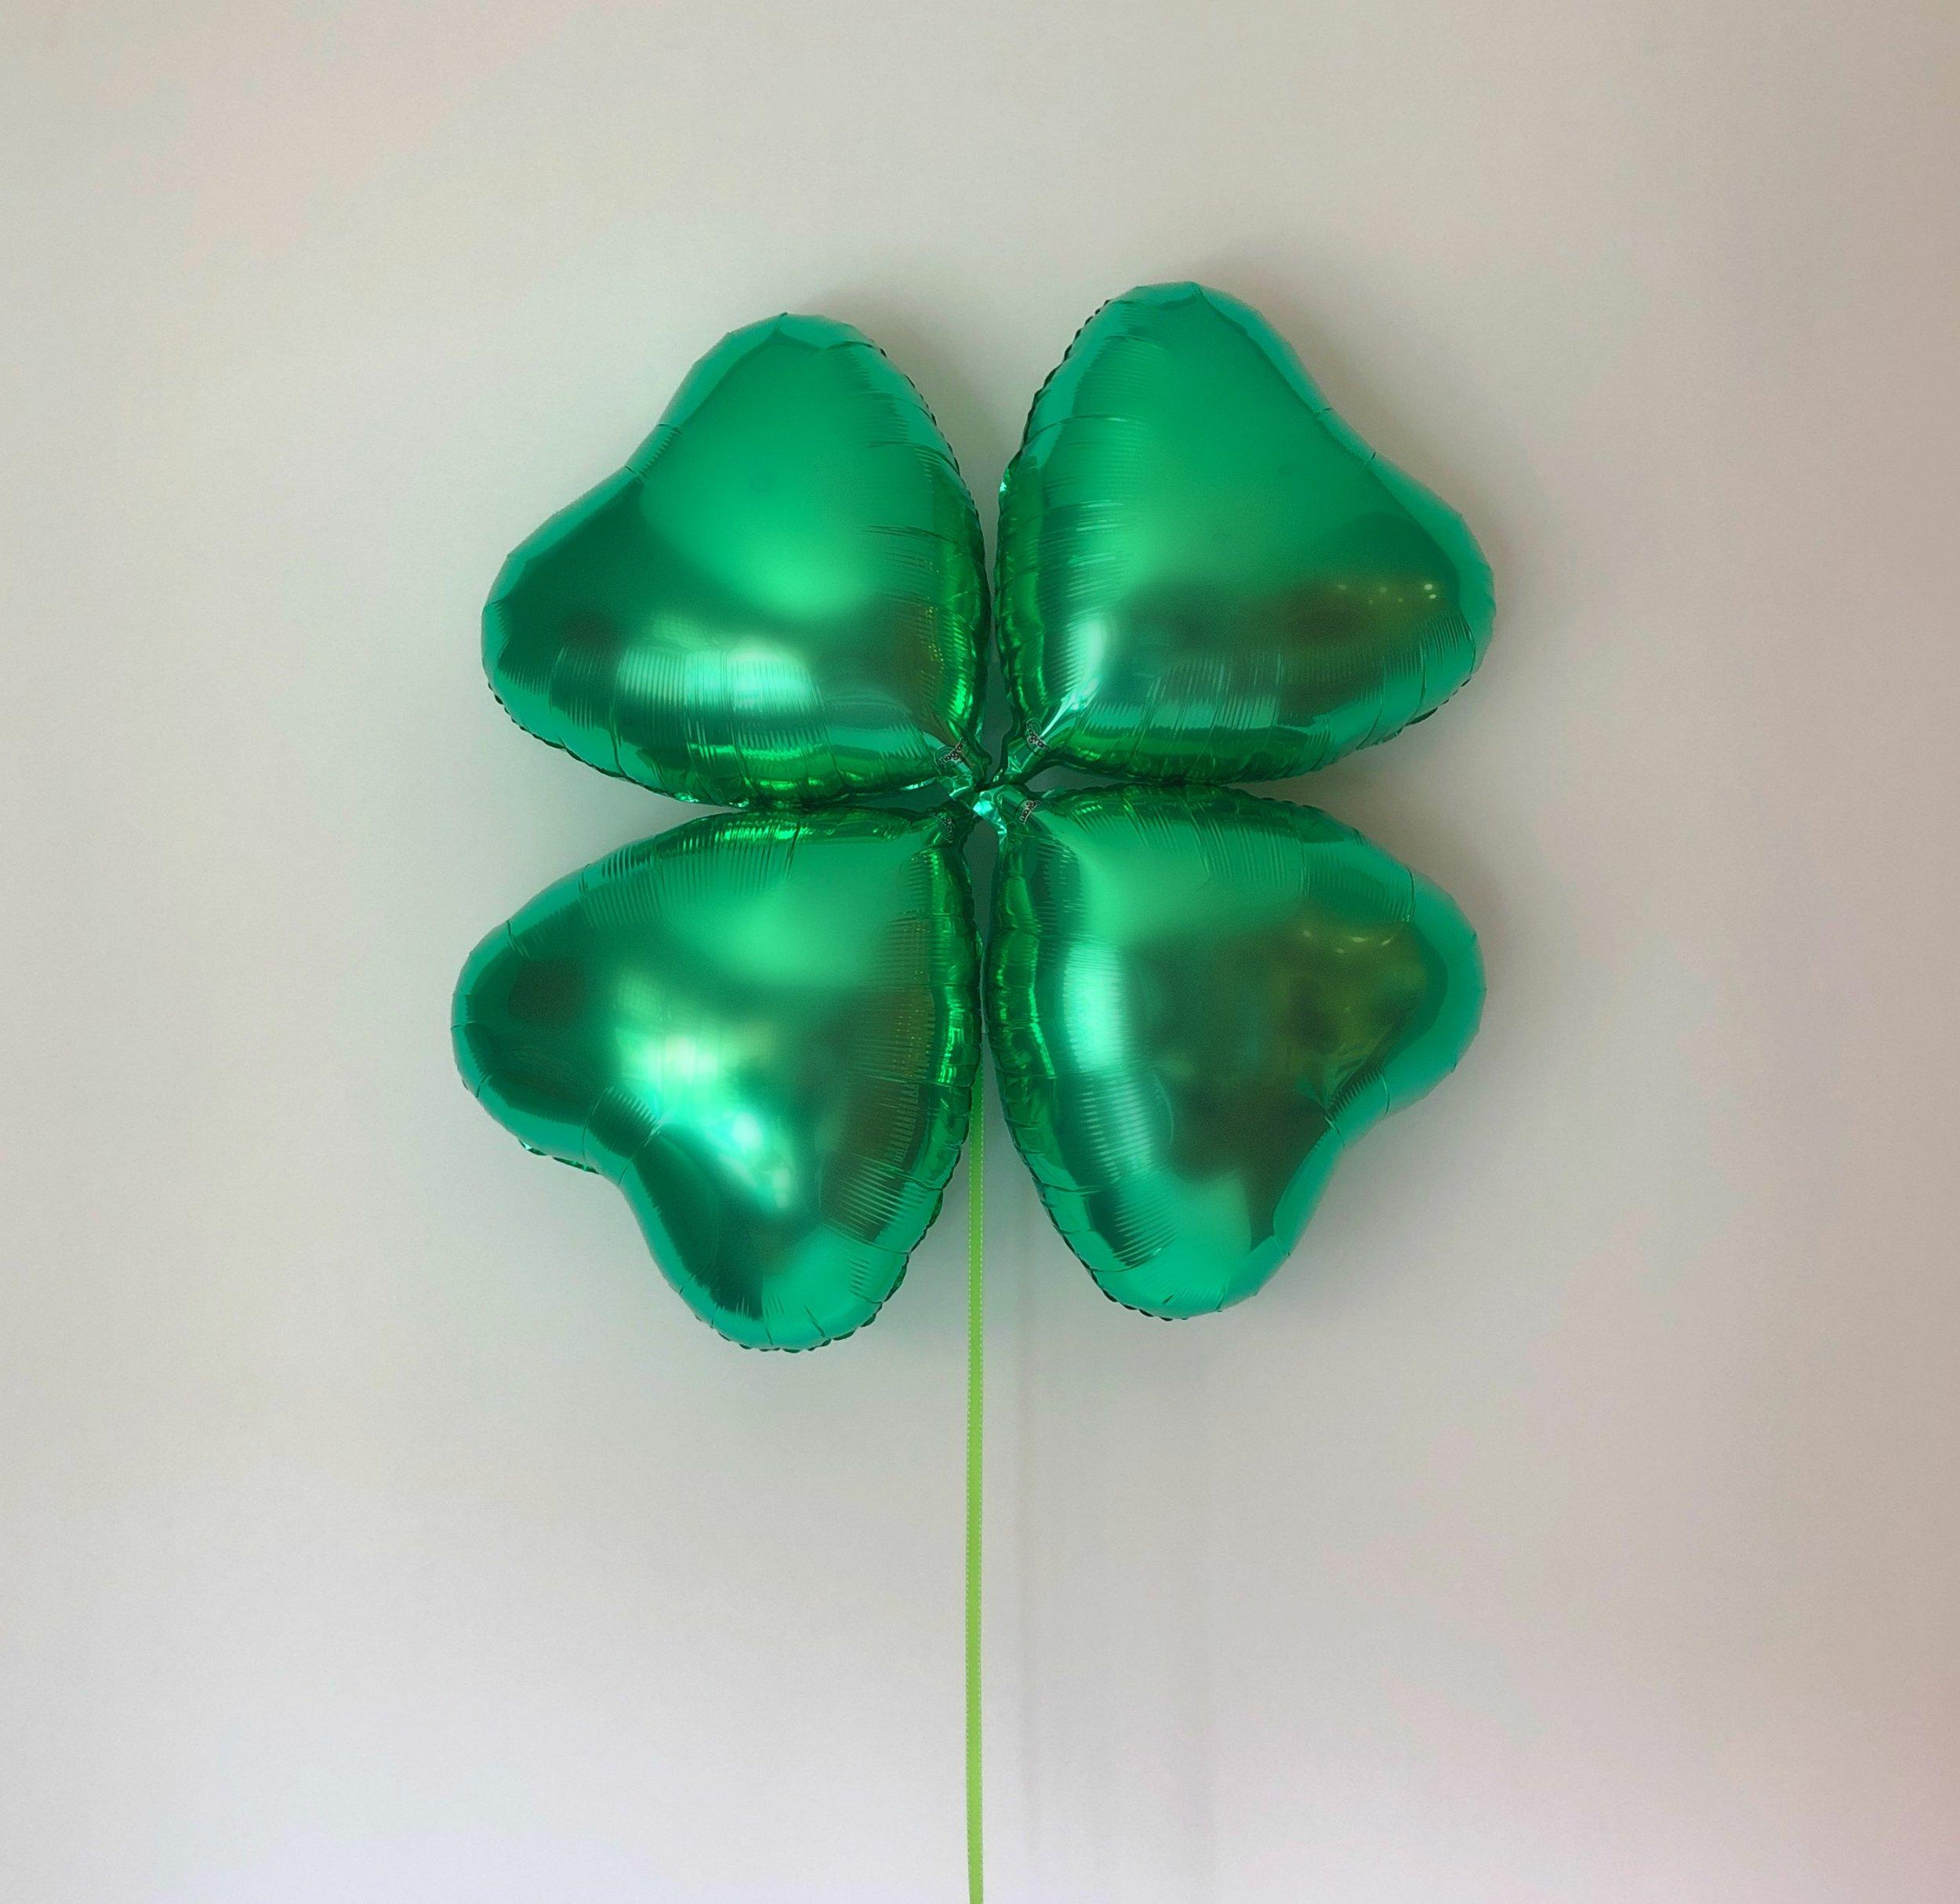 clover-balloons-2.jpg